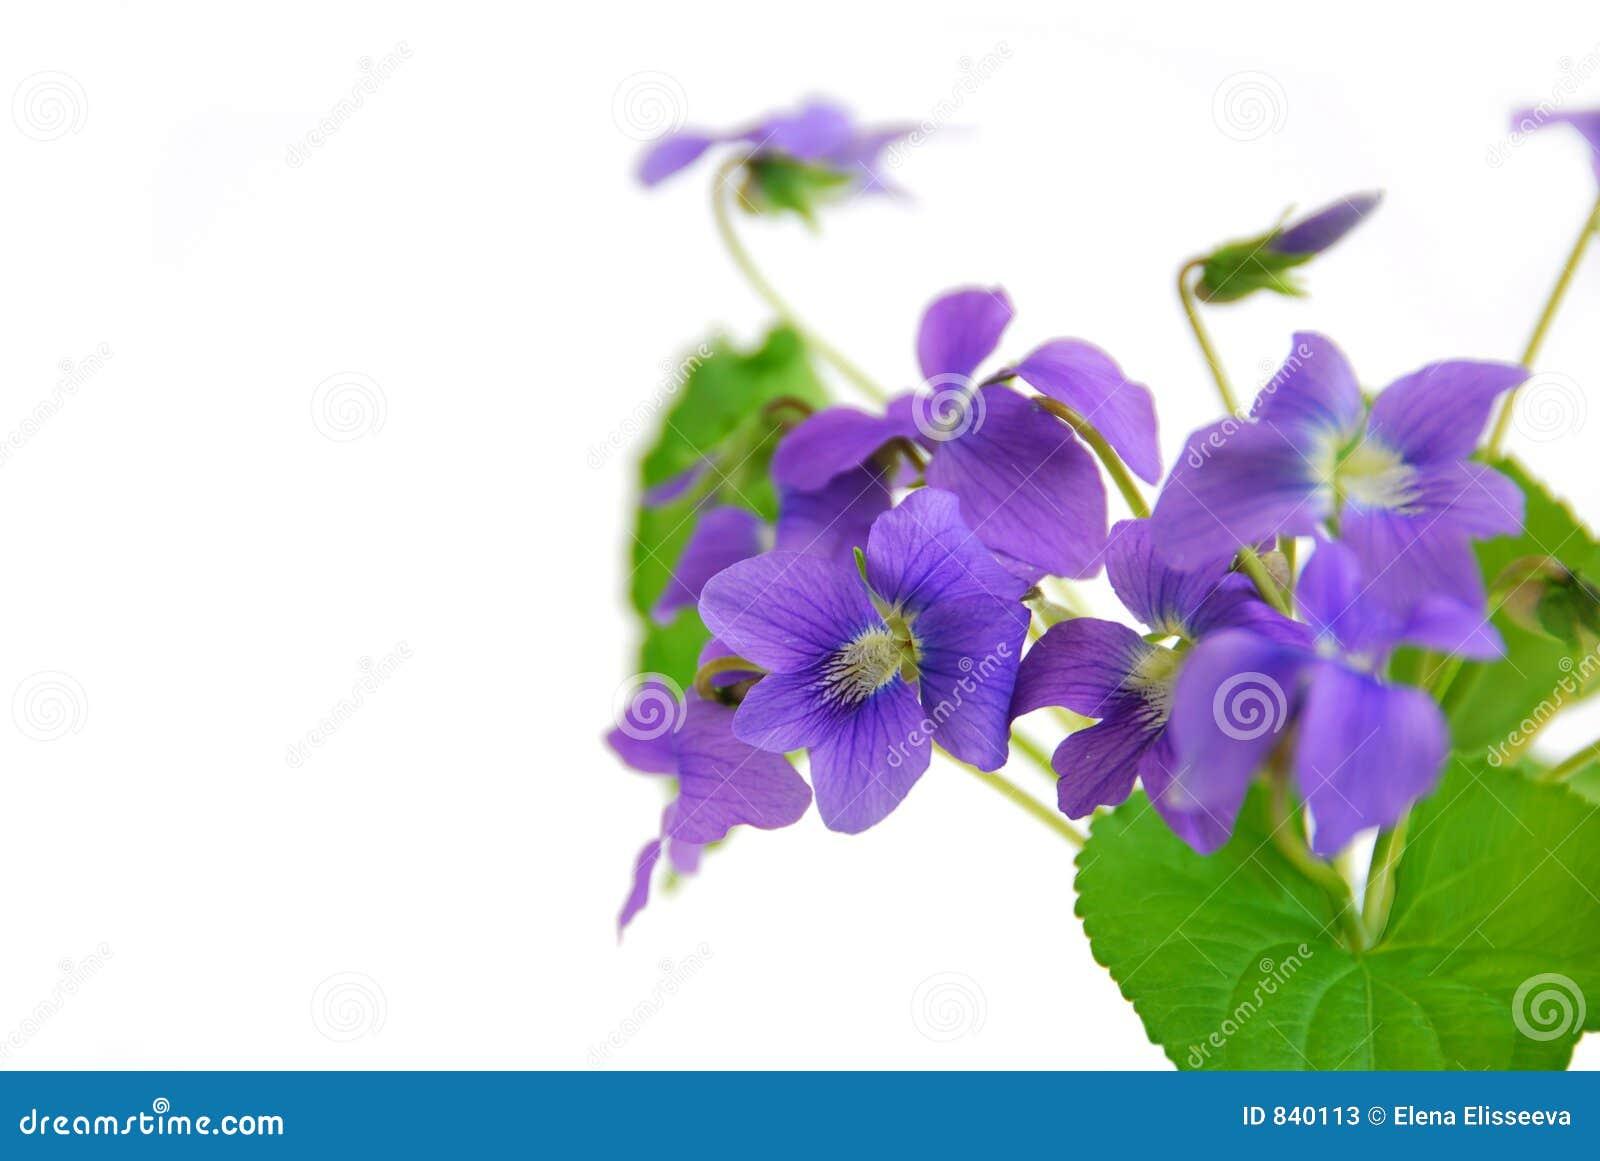 Violets on white background